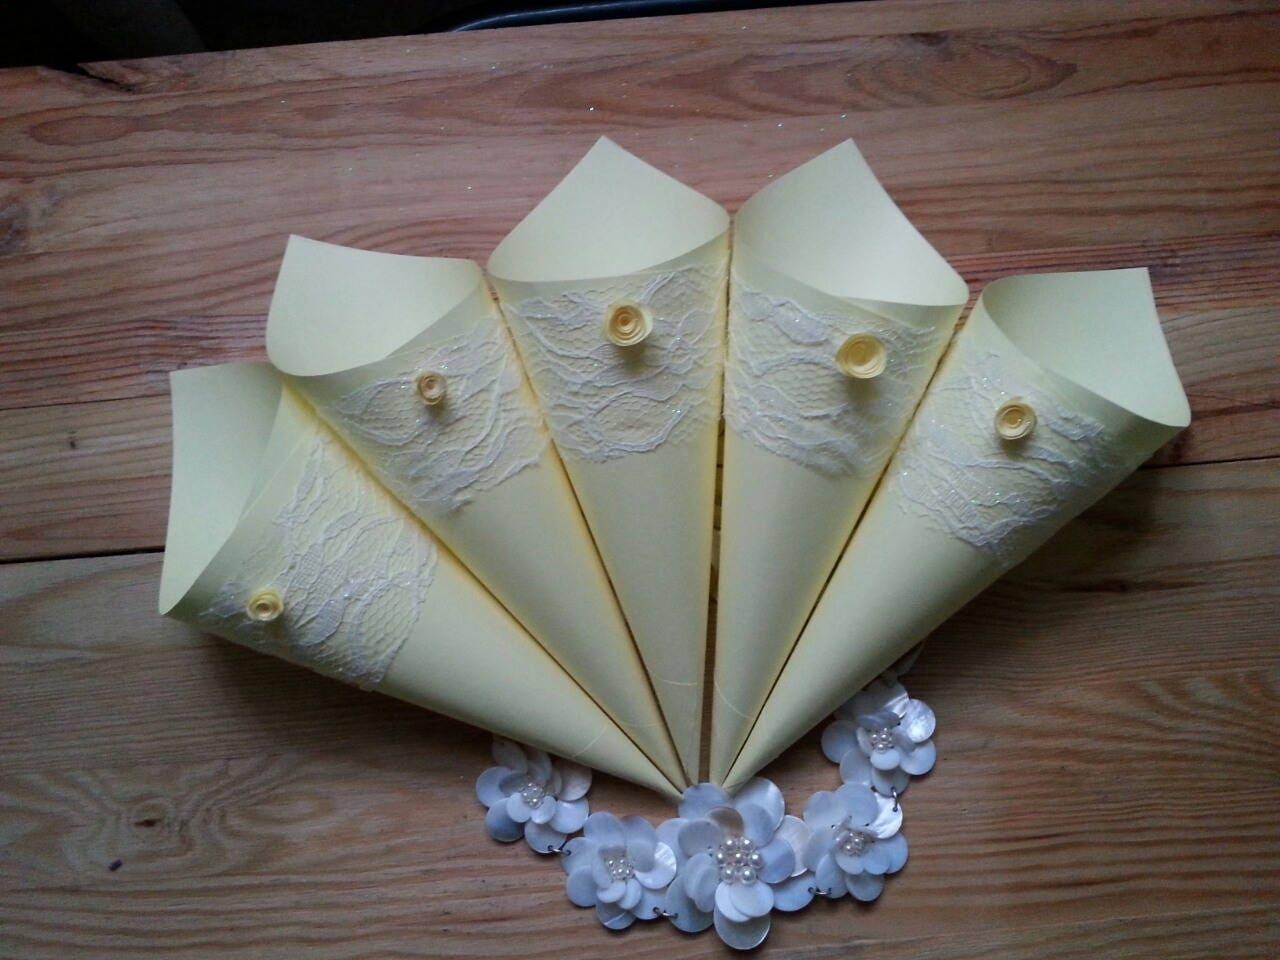 Wedding yellow confetti cones wedding rose petal confetti paper wedding yellow confetti cones wedding rose petal confetti paper cones for wedding flowers mightylinksfo Image collections